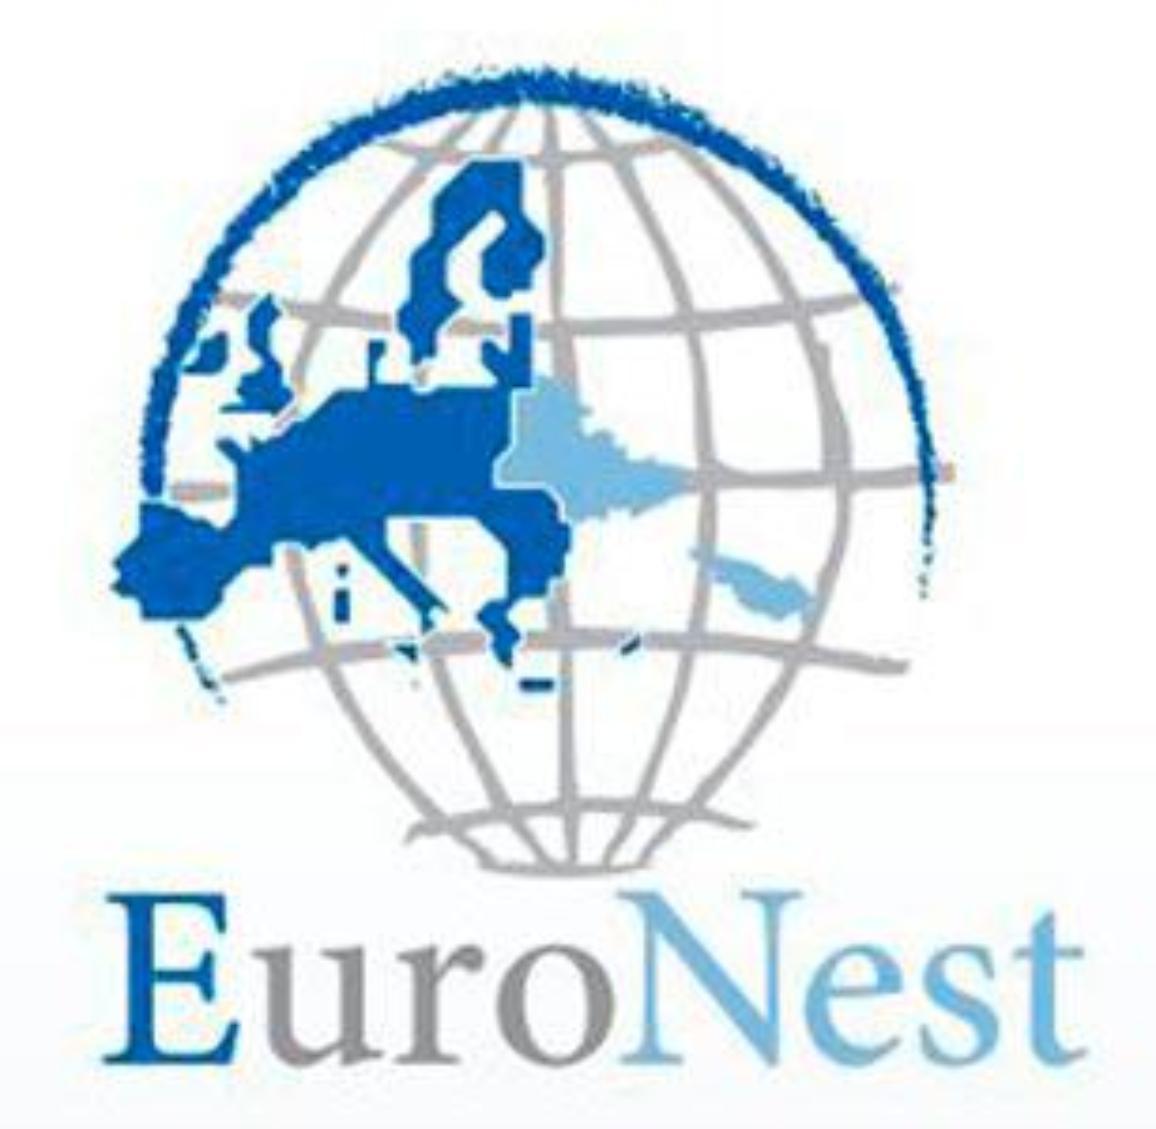 Euronest logo